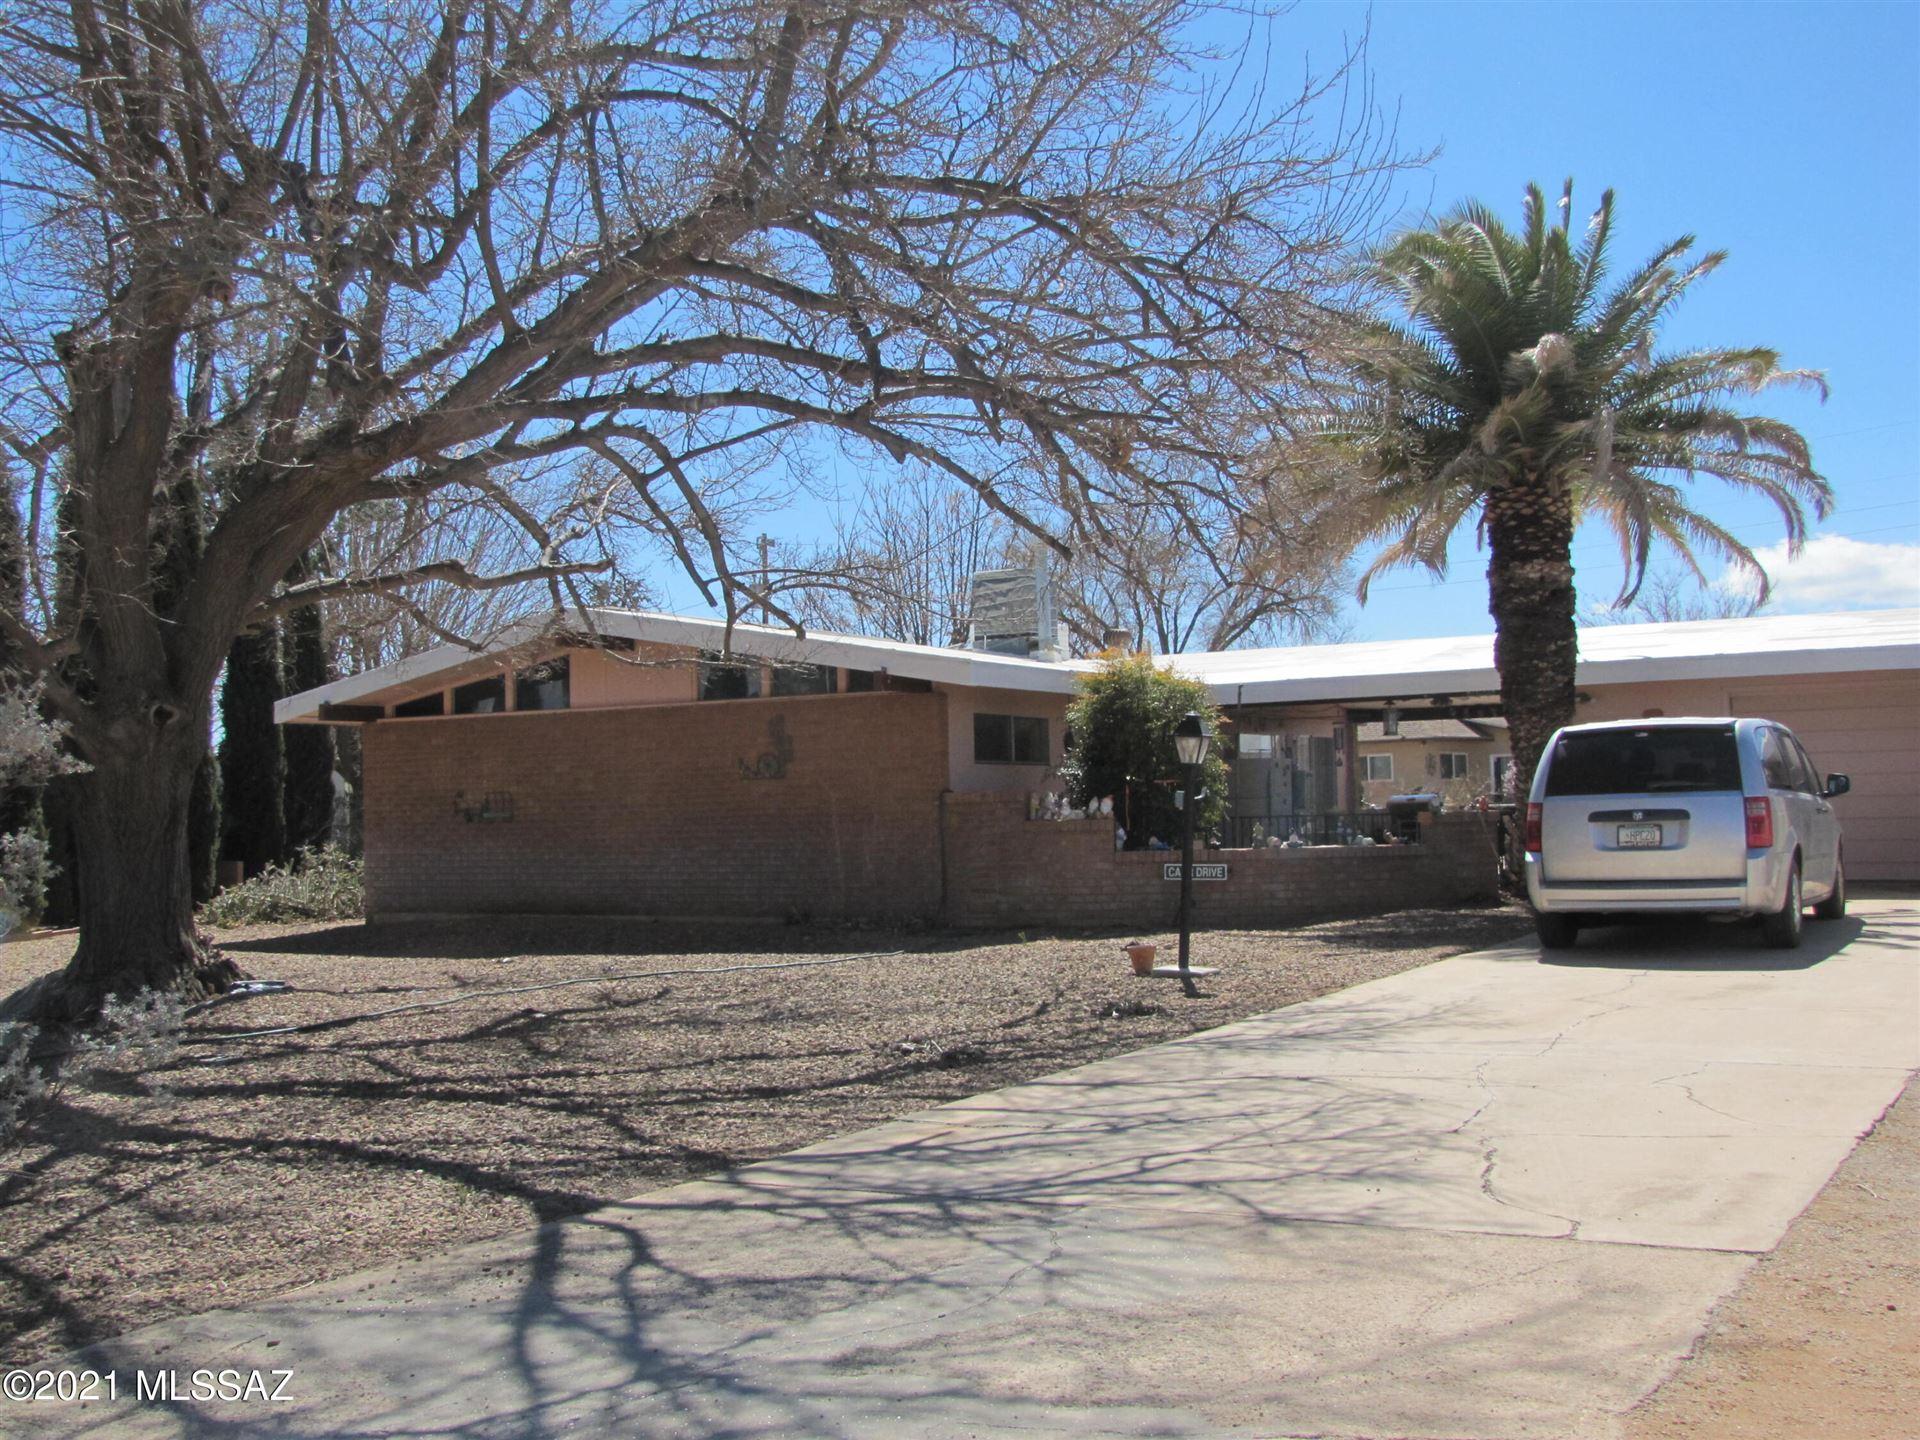 307 N Flynn Jans Court, Pearce, AZ 85625 - MLS#: 22106996